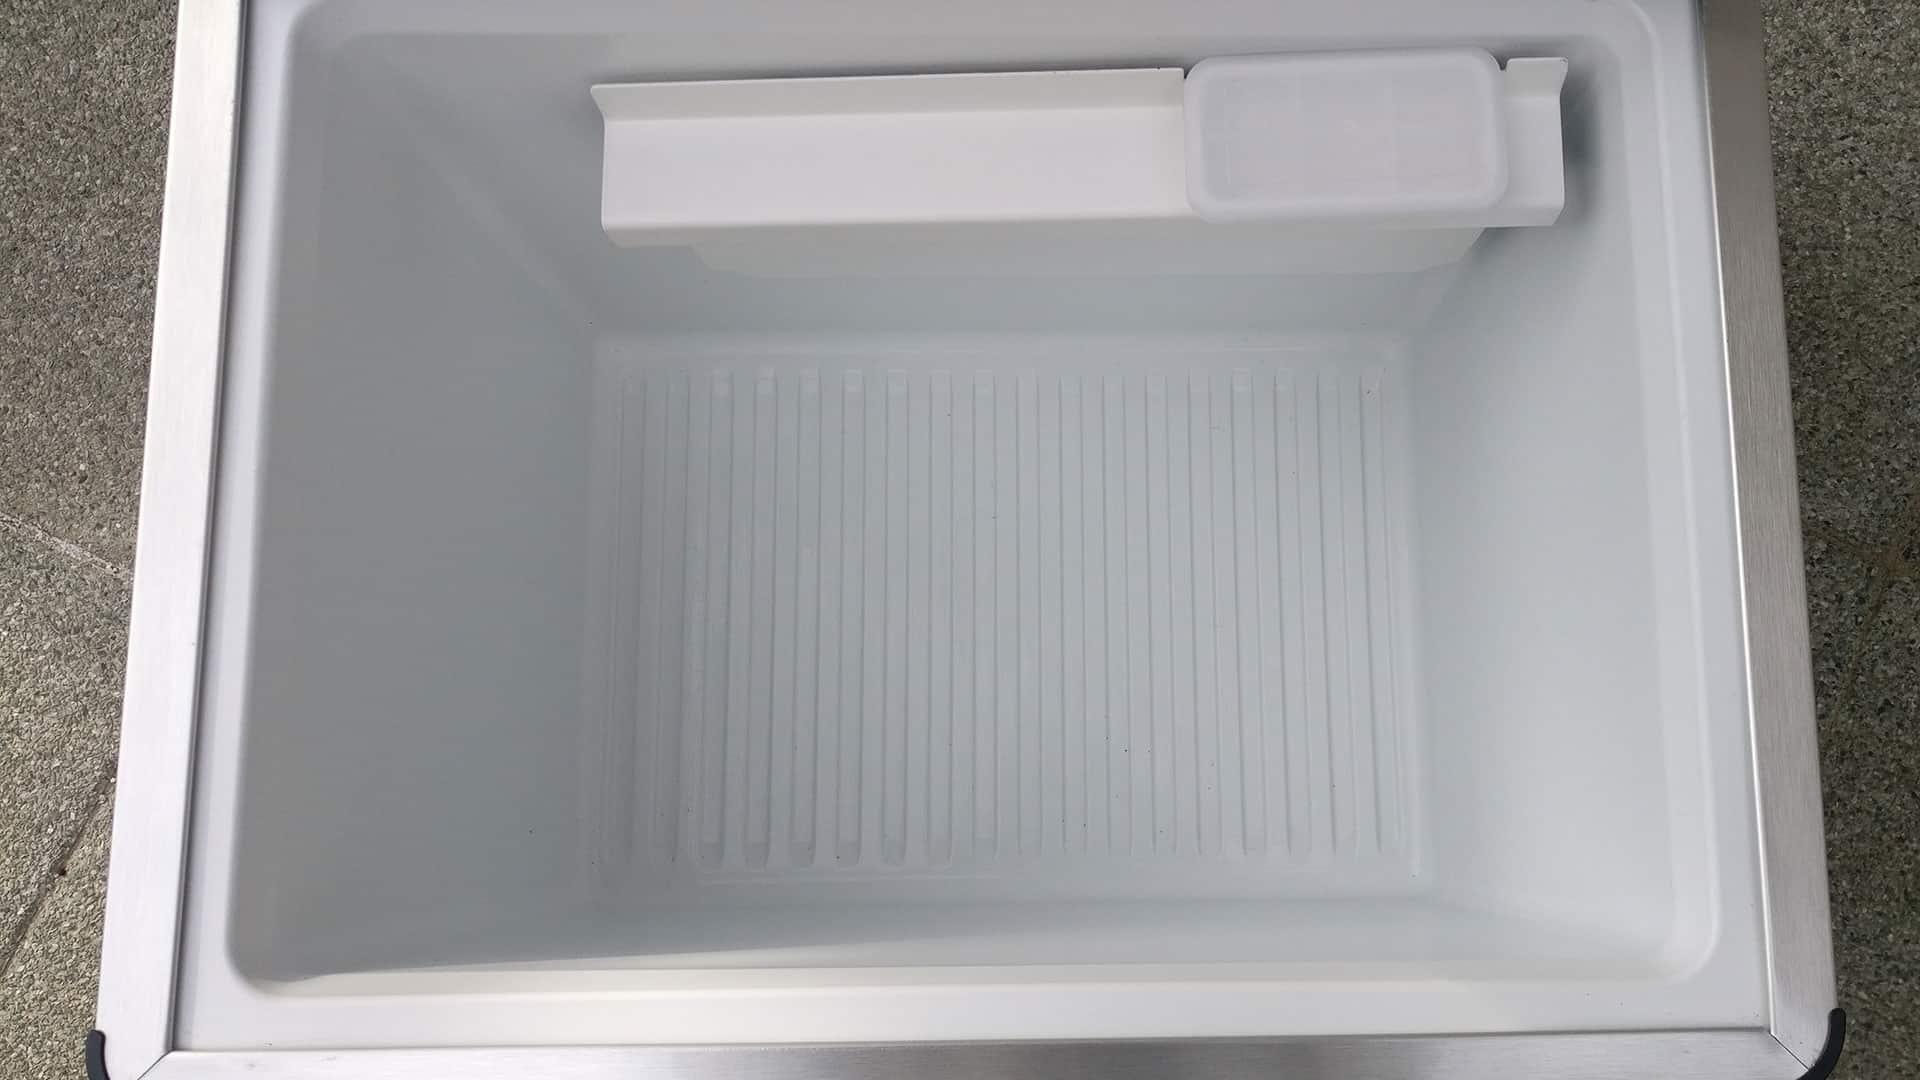 Gorenje Kühlschrank Brummt : Gorenje kühlschrank brummen: siemens kühlschrank brummt sehr laut